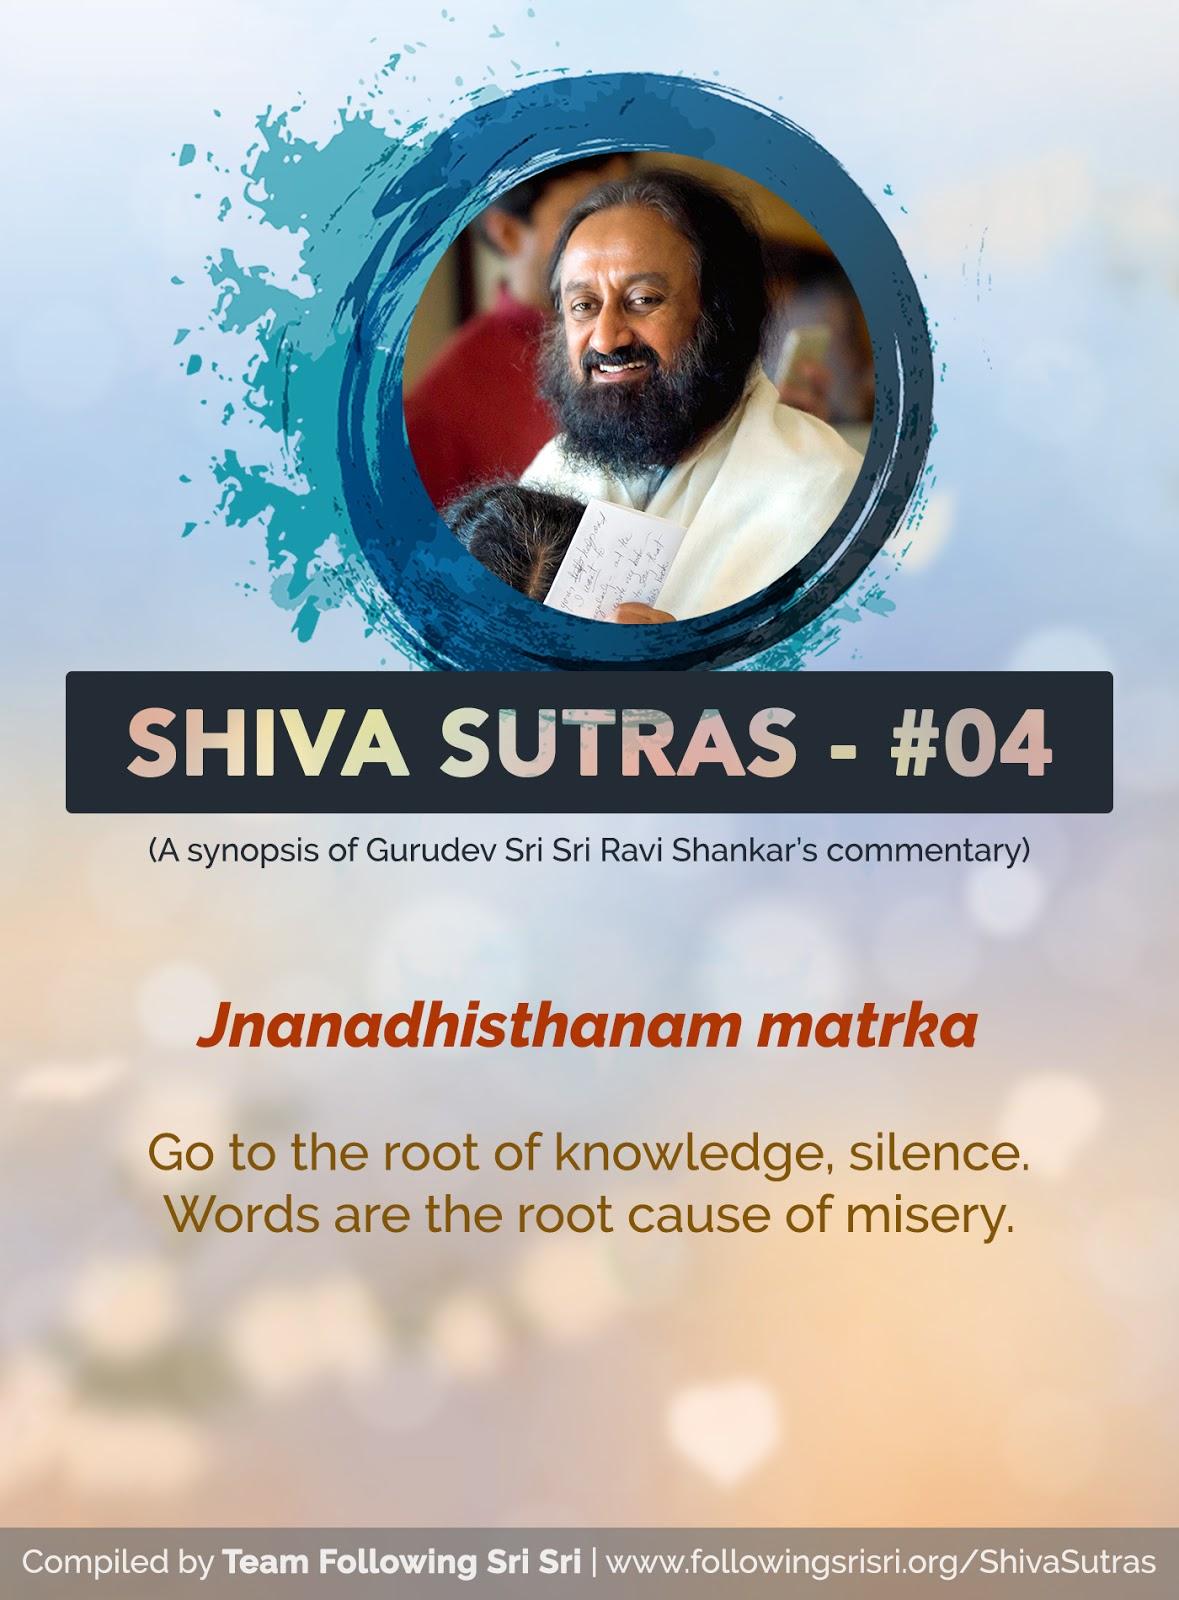 Shiva Sutras - Sutra 4